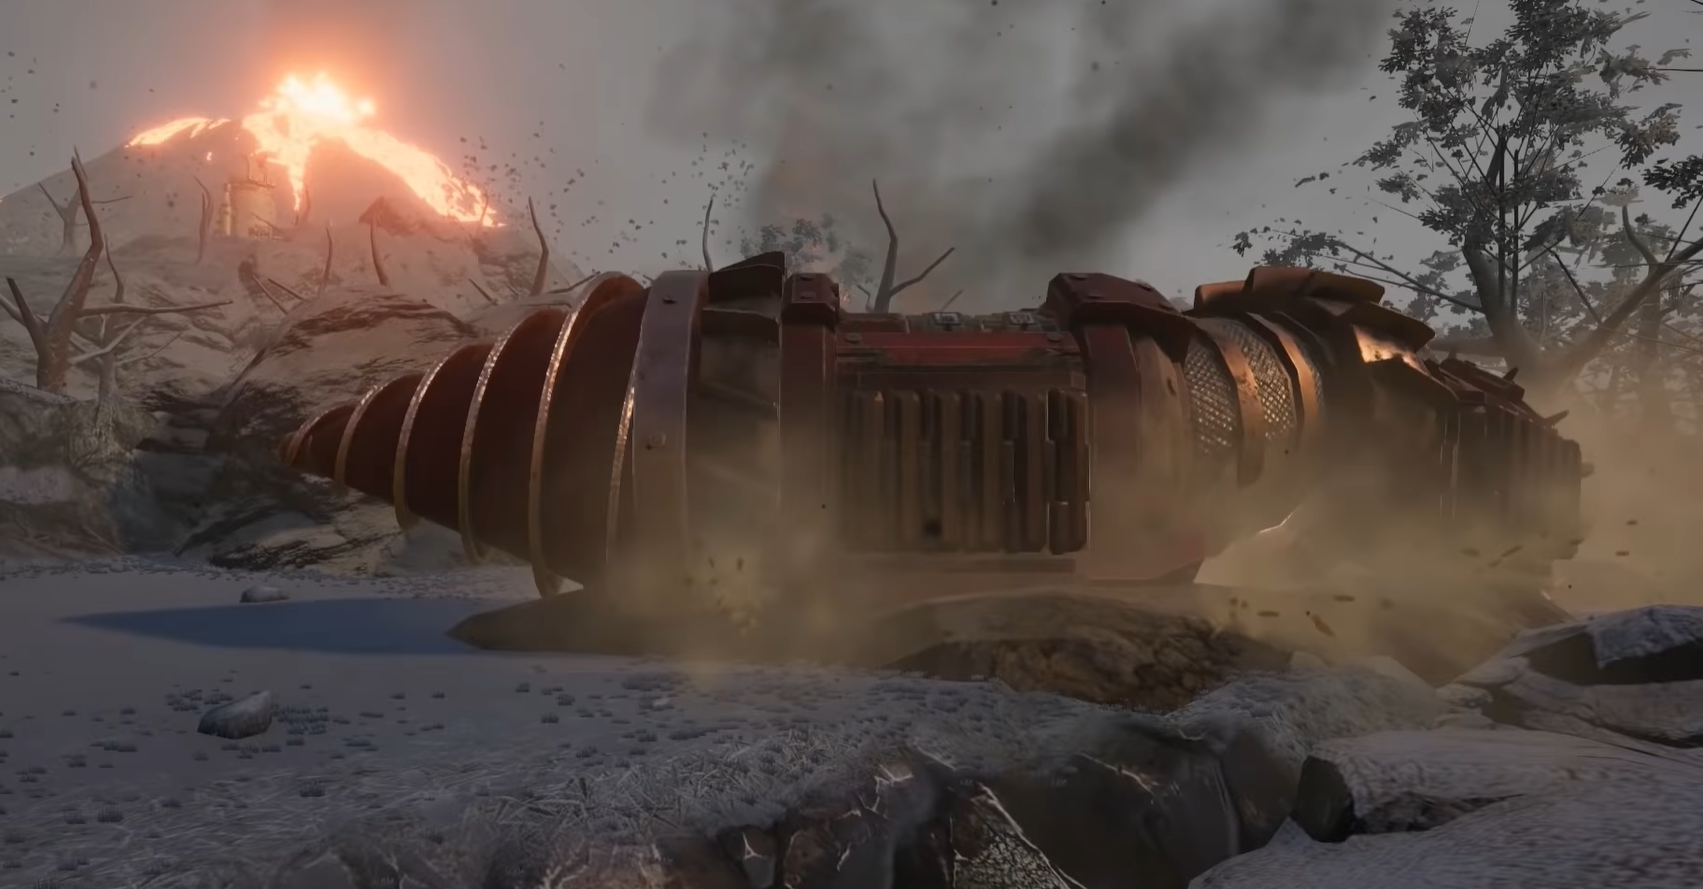 Image Source: Volcanoids, via YouTube